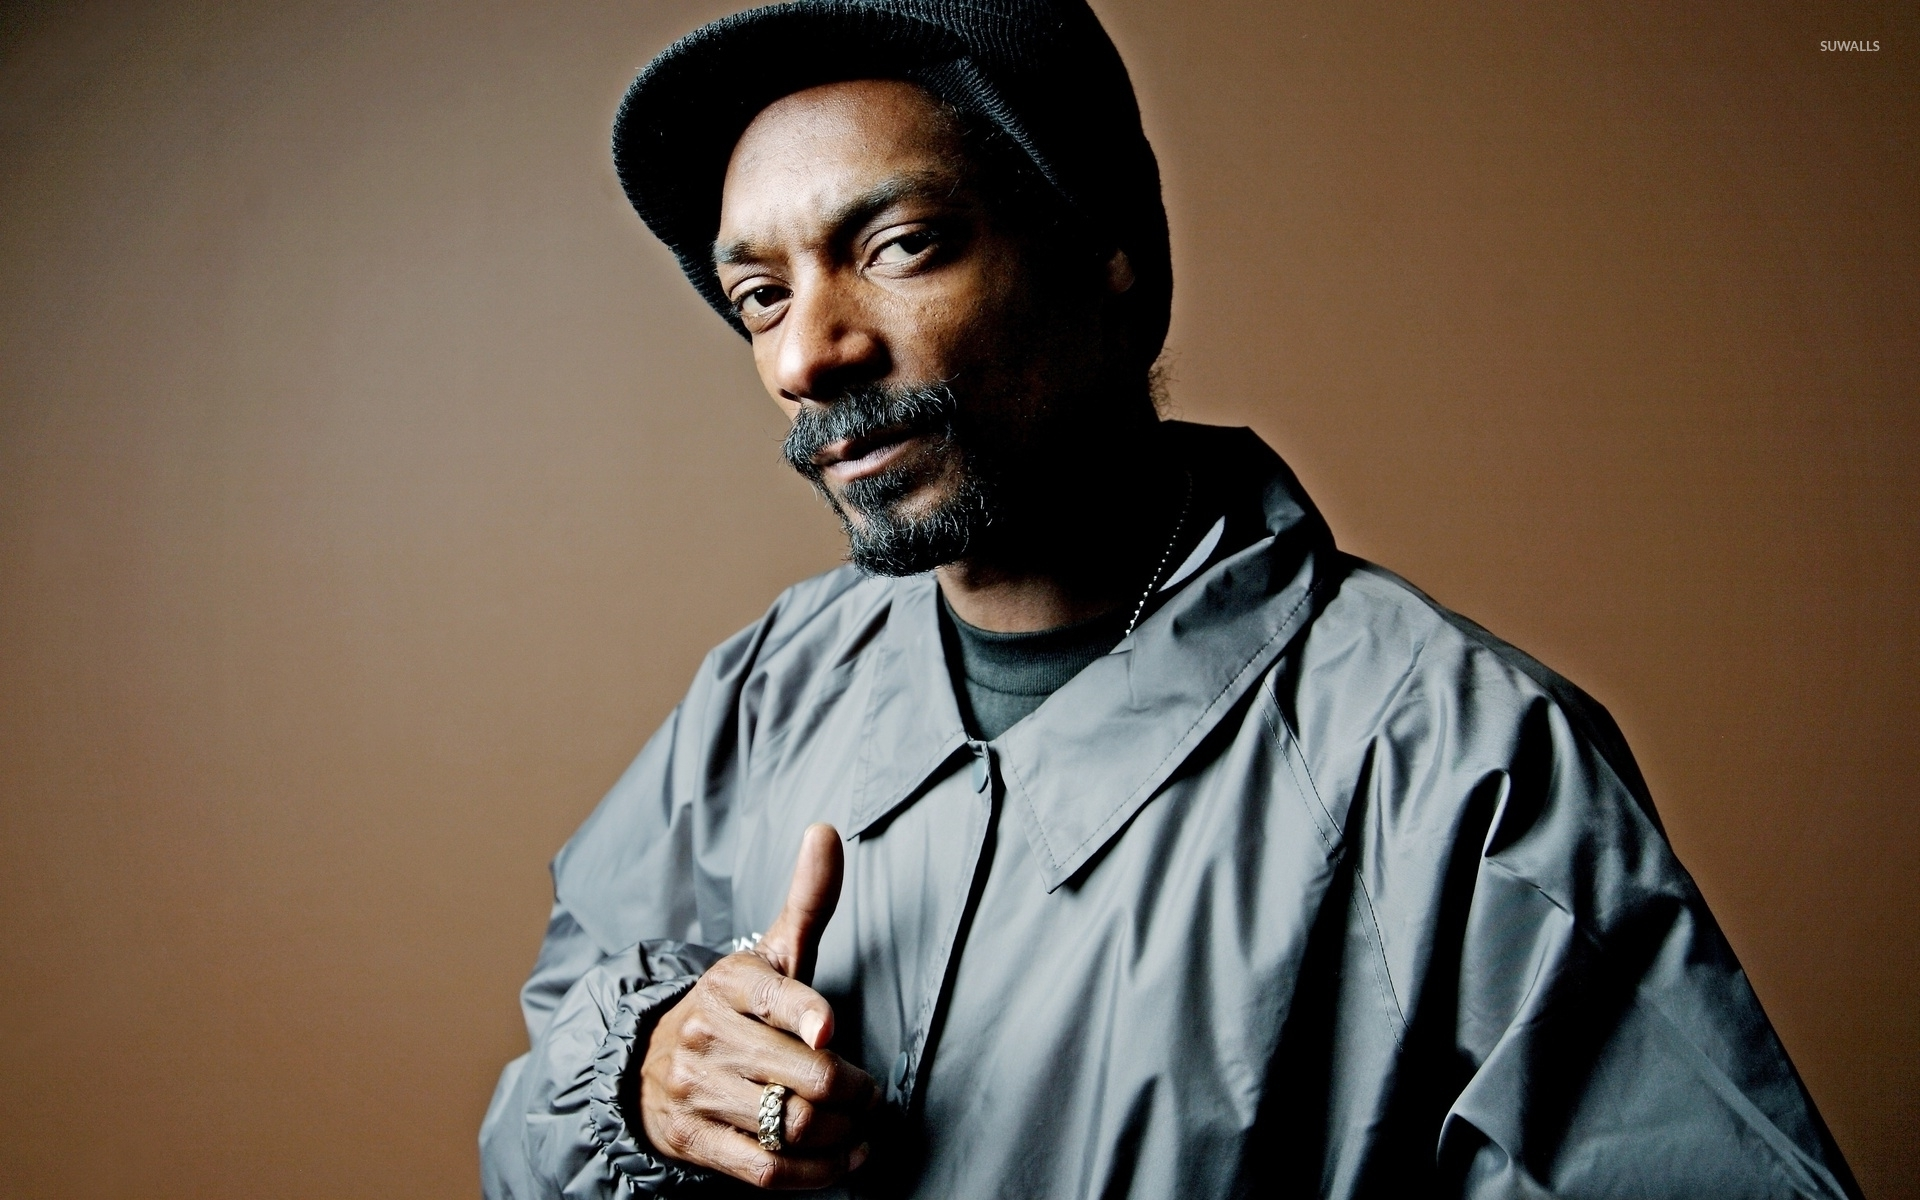 Enjoyable Snoop Dogg In A Gray Jacket Wallpaper Male Celebrity Wallpapers Short Hairstyles Gunalazisus